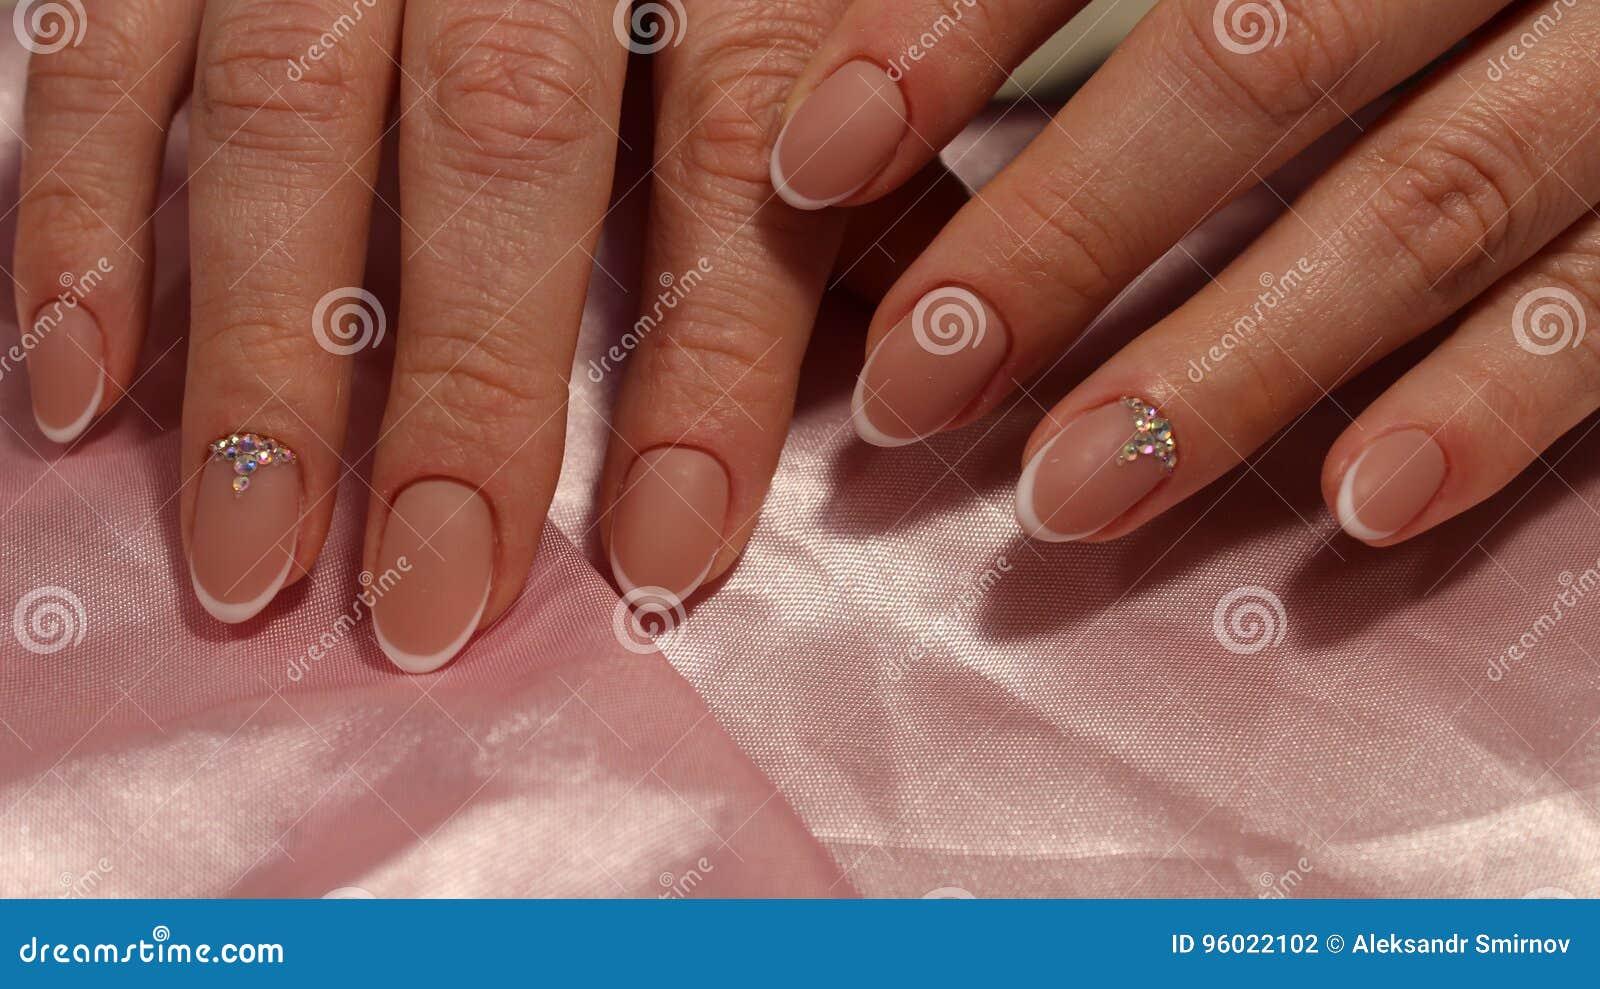 Wedding French Manicure Design Stock Photo - Image of bride, beauty ...